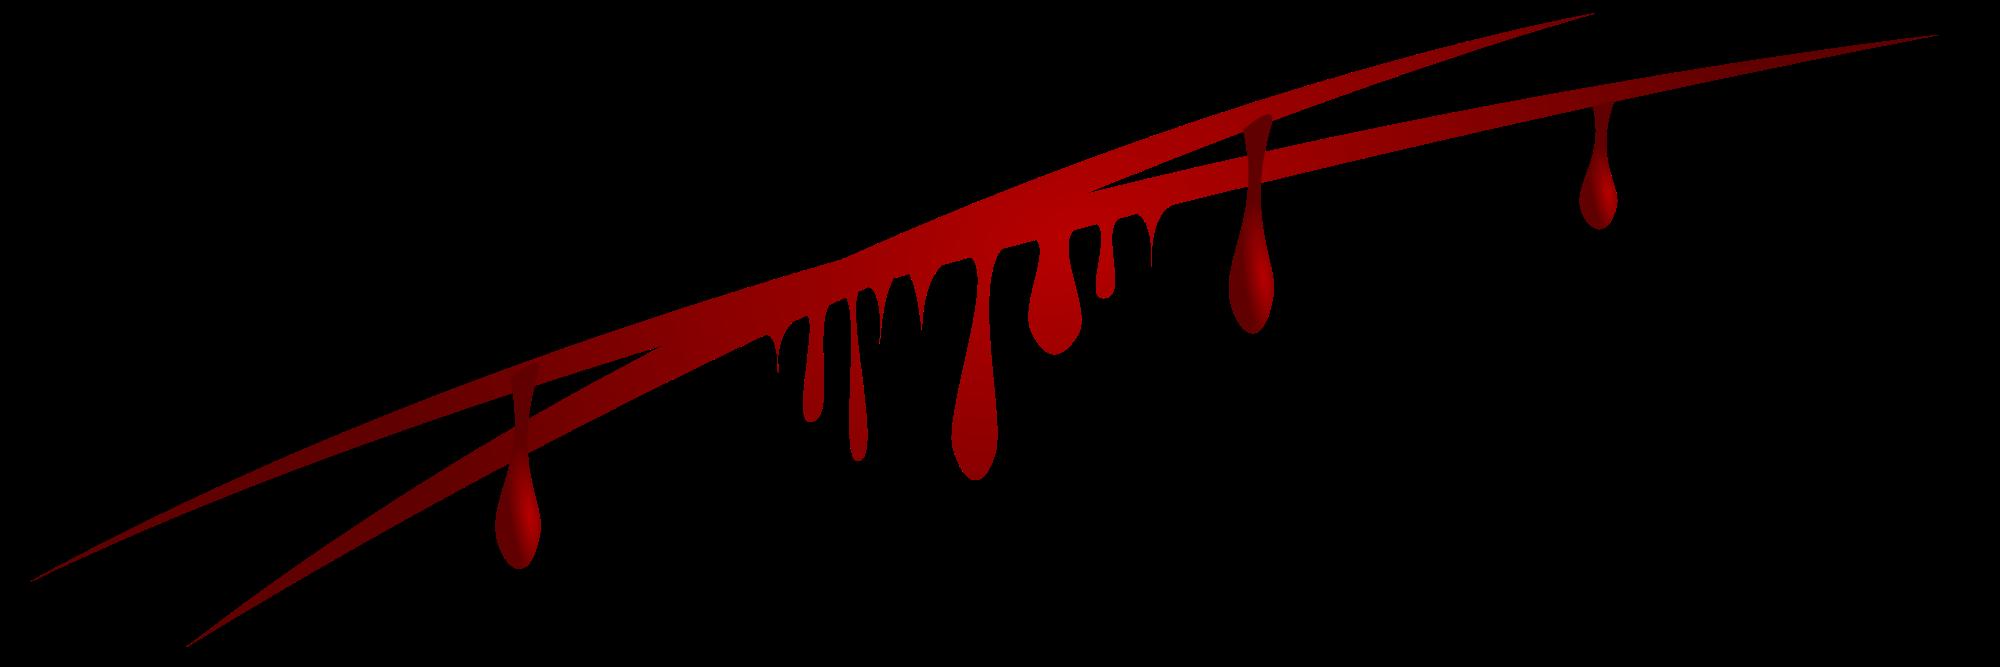 Scar clipart transparent Scar PNG background PNG image